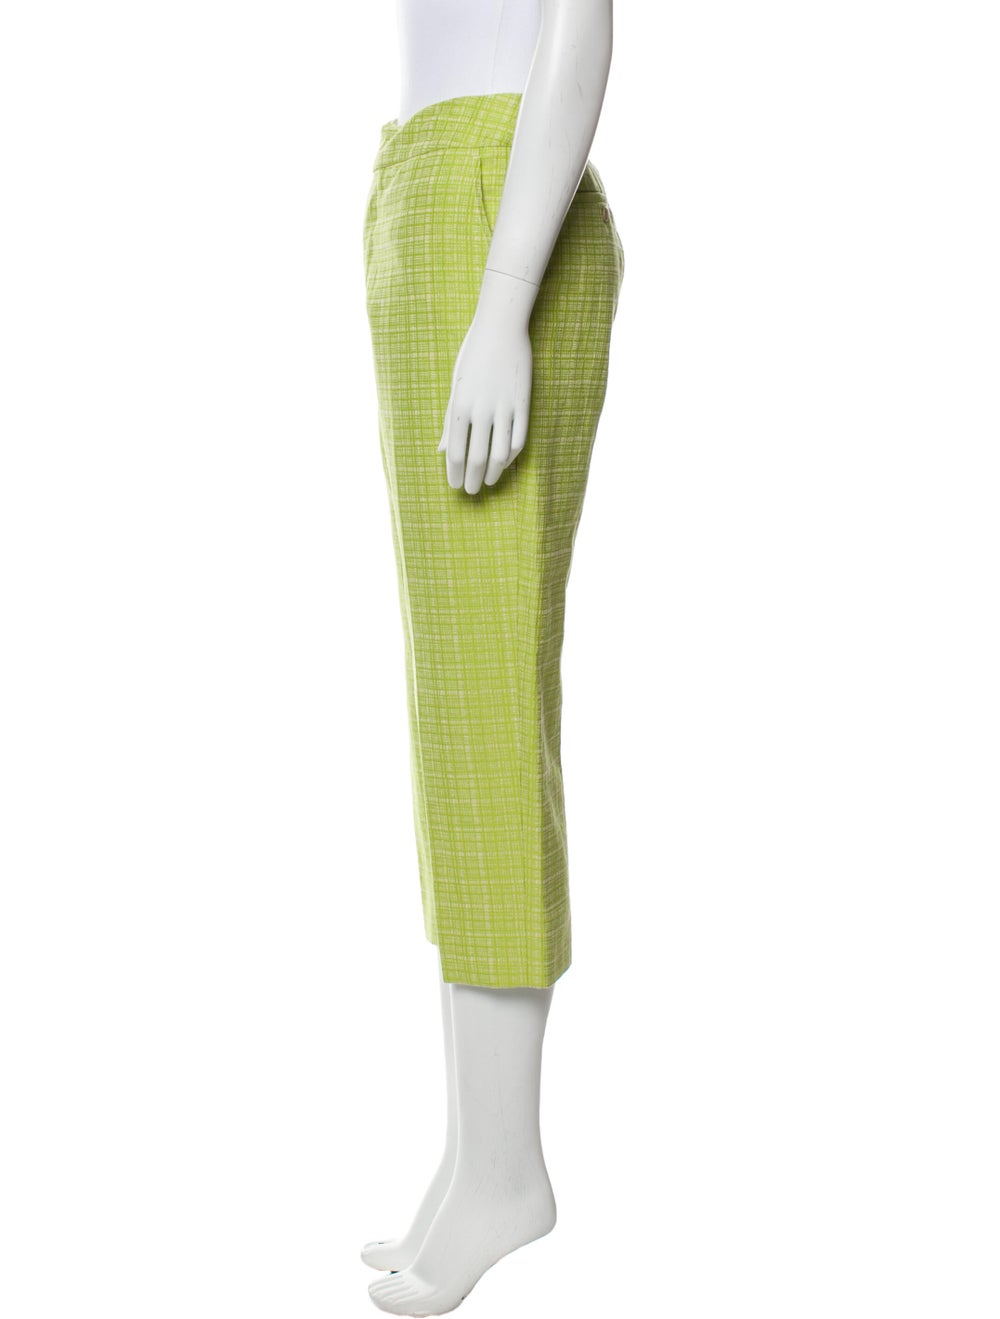 Marni Plaid Print Straight Leg Pants Green - image 2